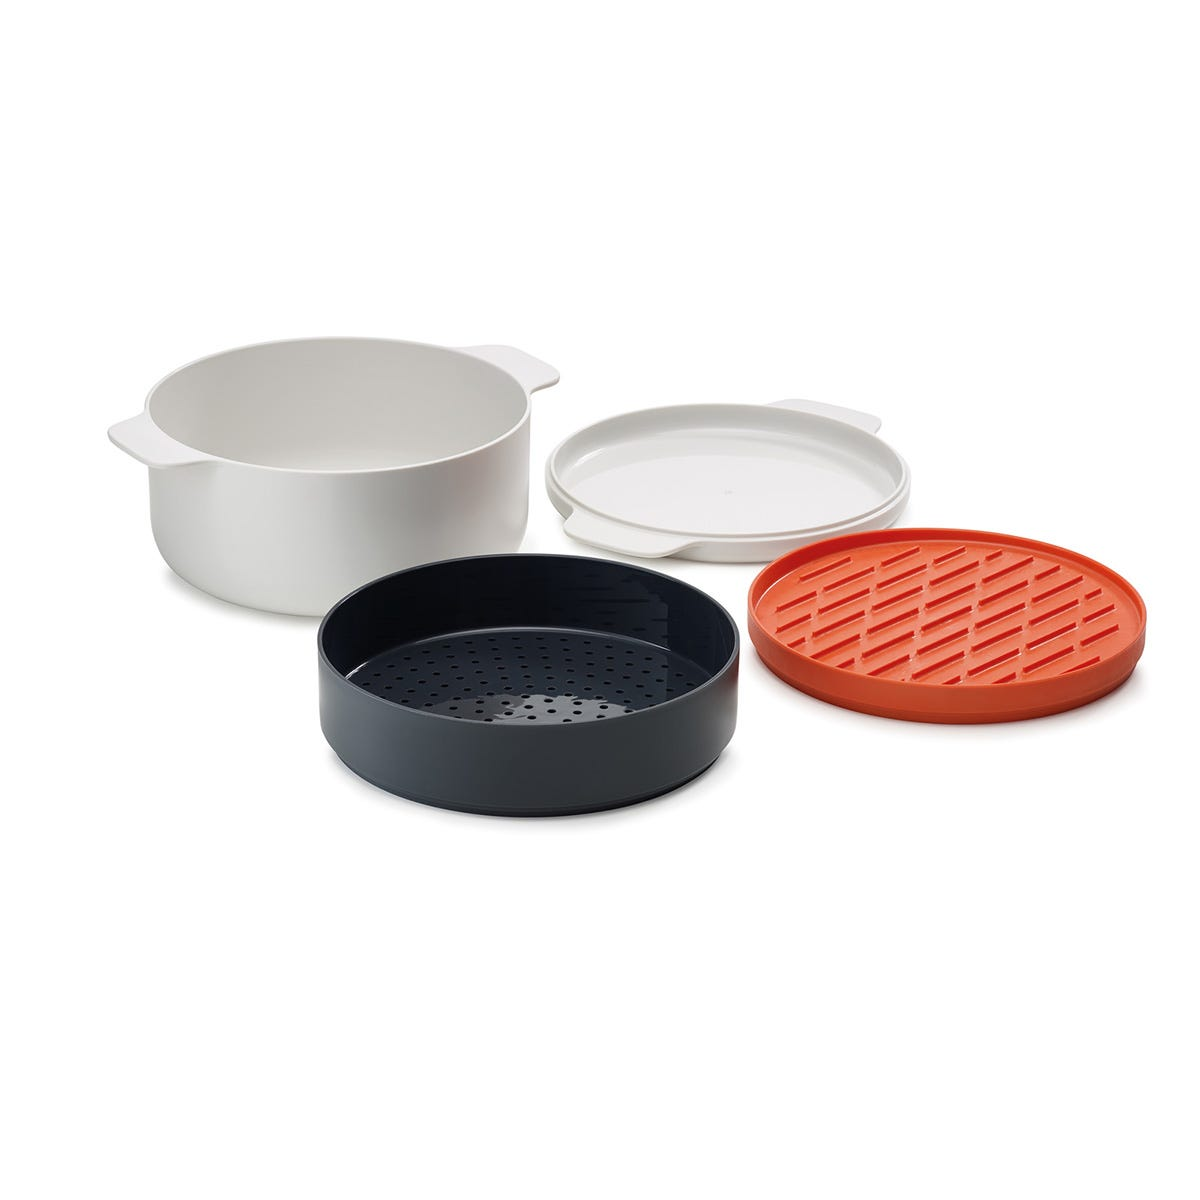 Joseph Joseph M-Cuisine Microwave 4-Piece Stackable Cooking Set